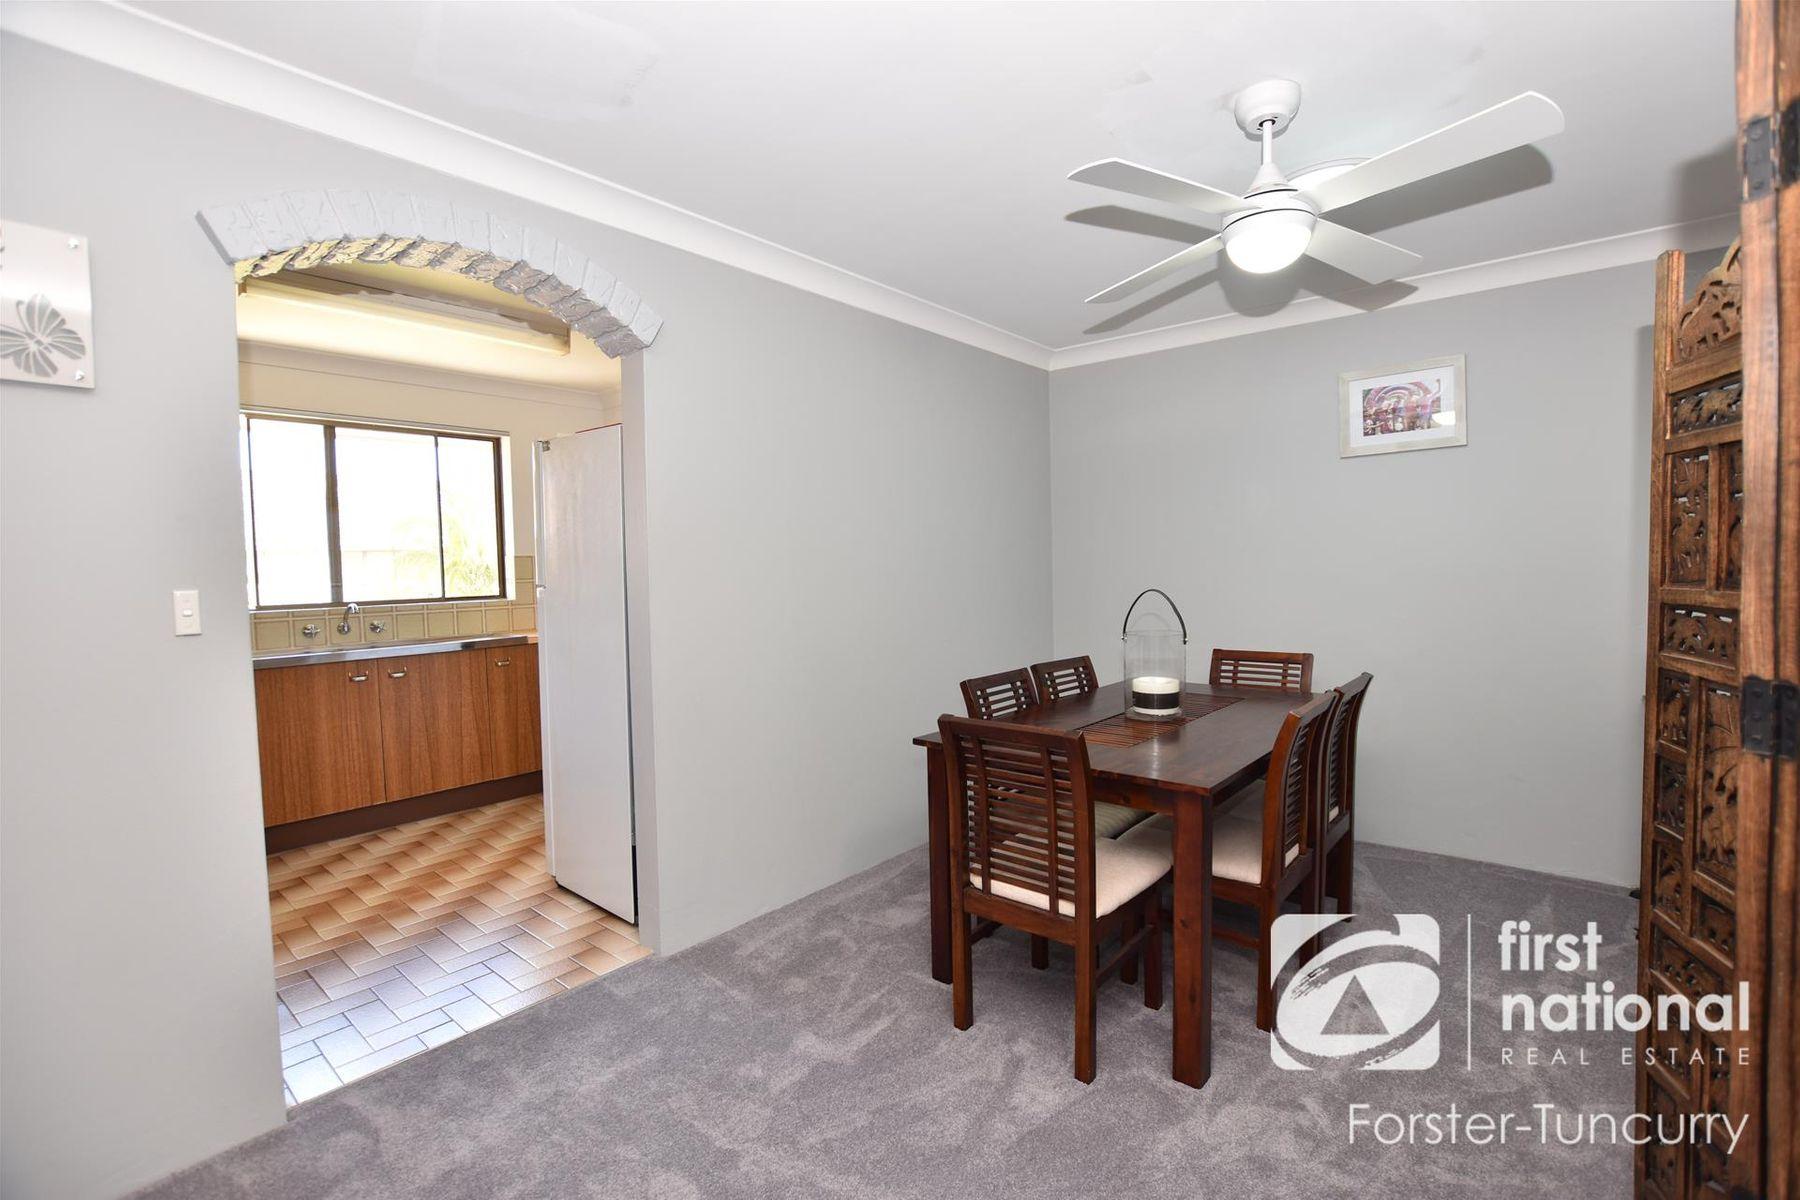 31/1-5 North Street, Tuncurry, NSW 2428